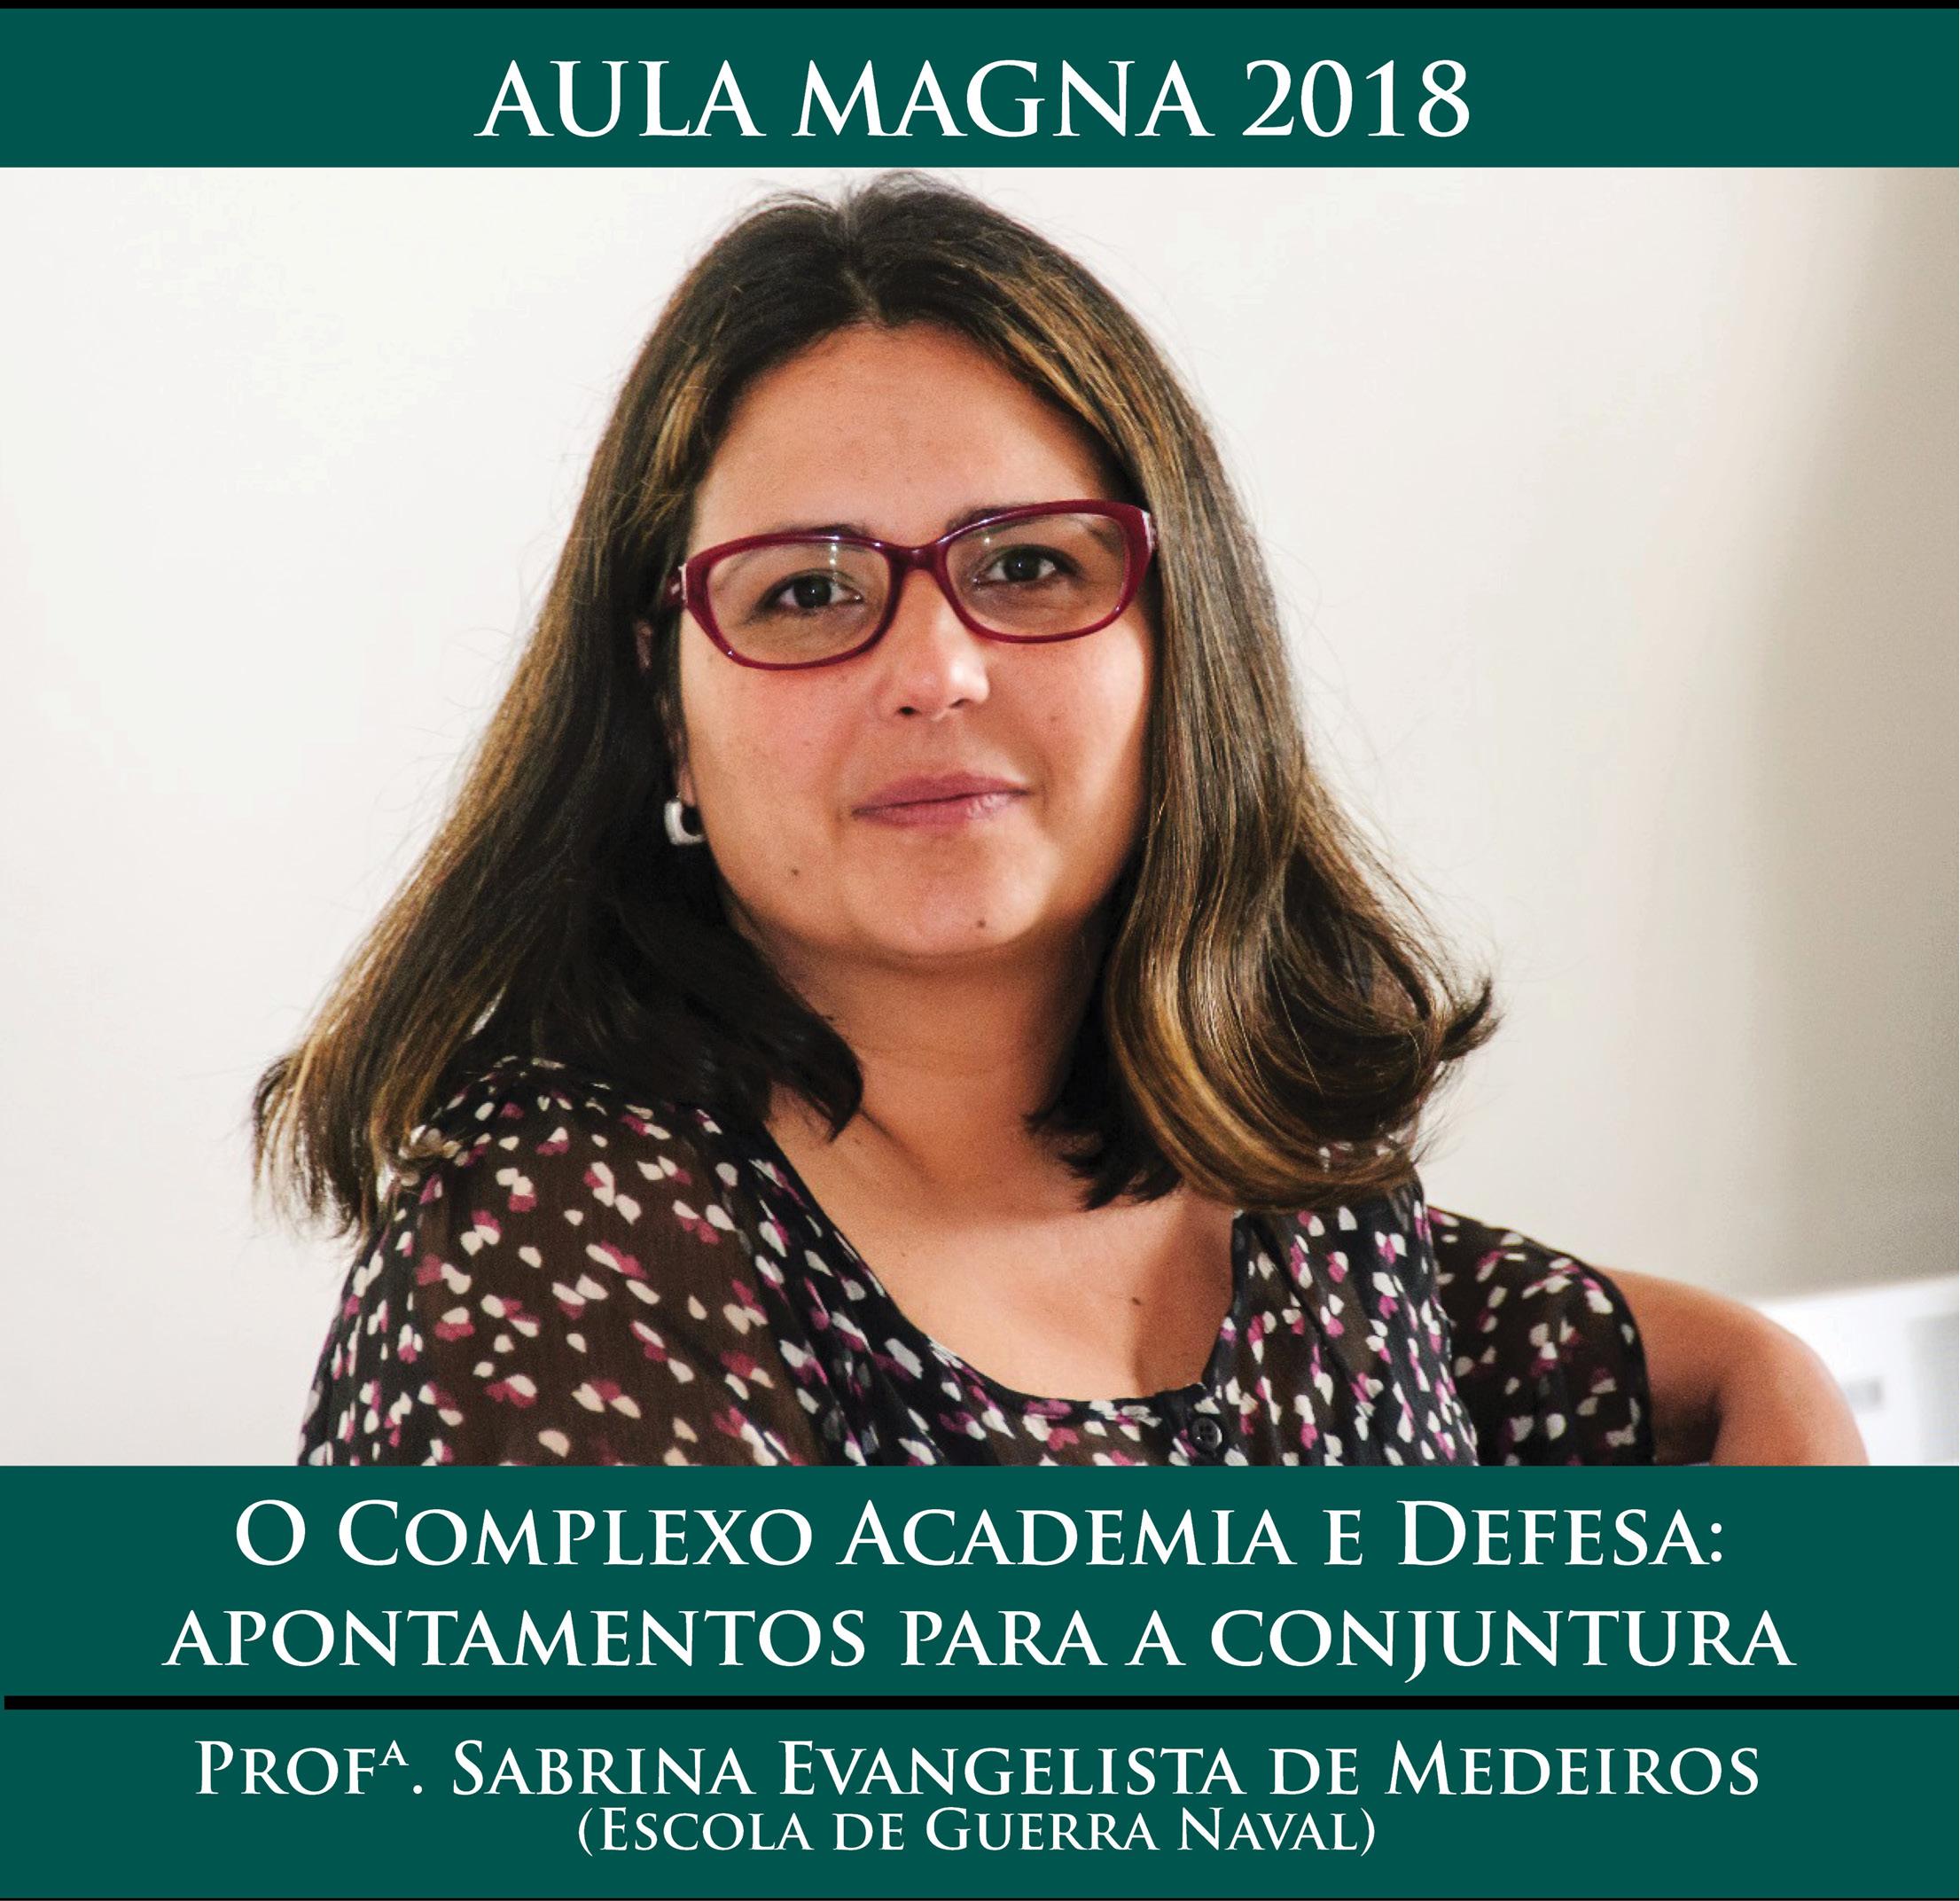 Aula Magna 2018